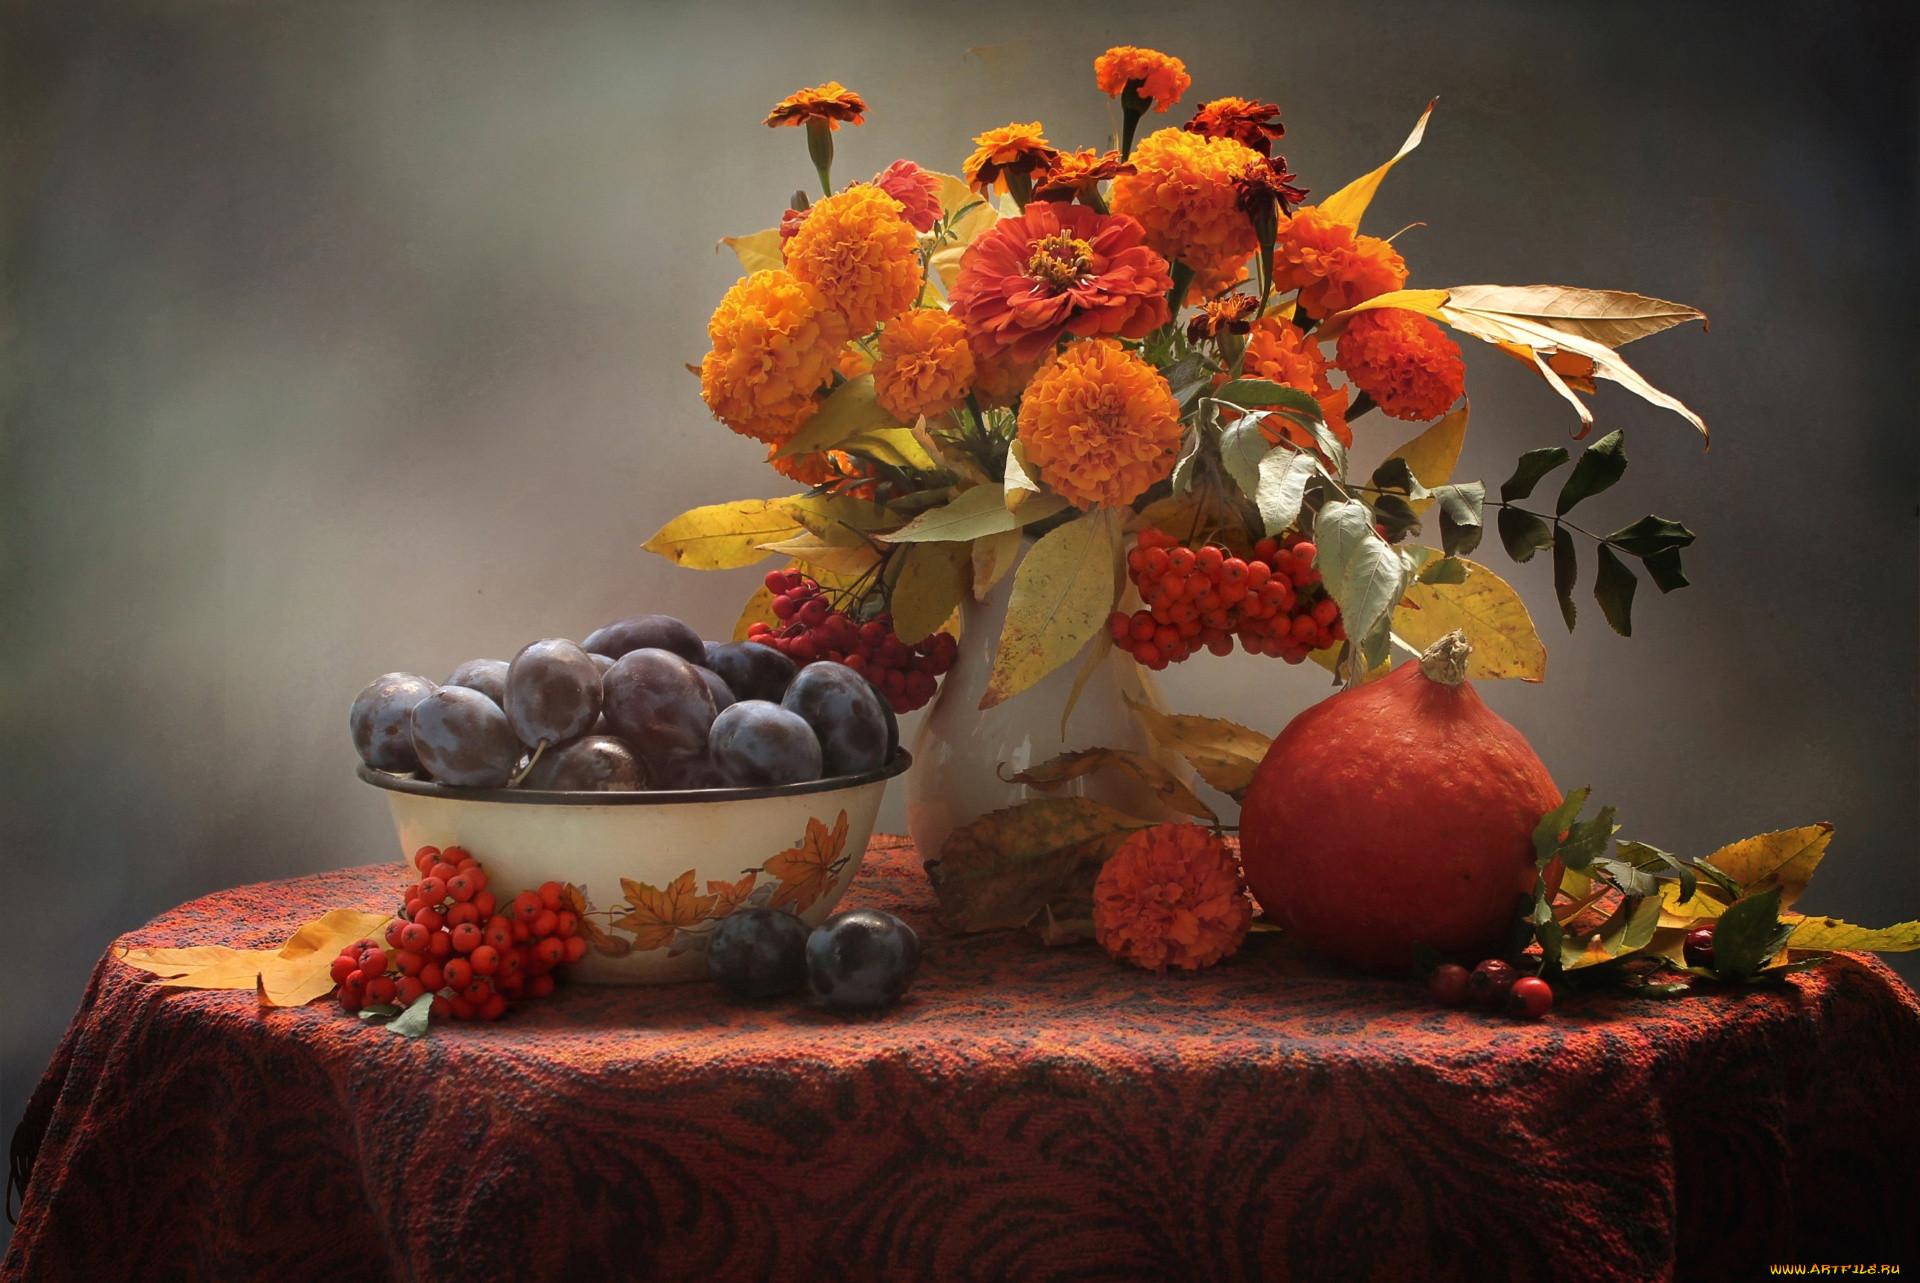 еда, натюрморт, сливы, рябина, осень, тыква, фрукты, бархатцы, цинния